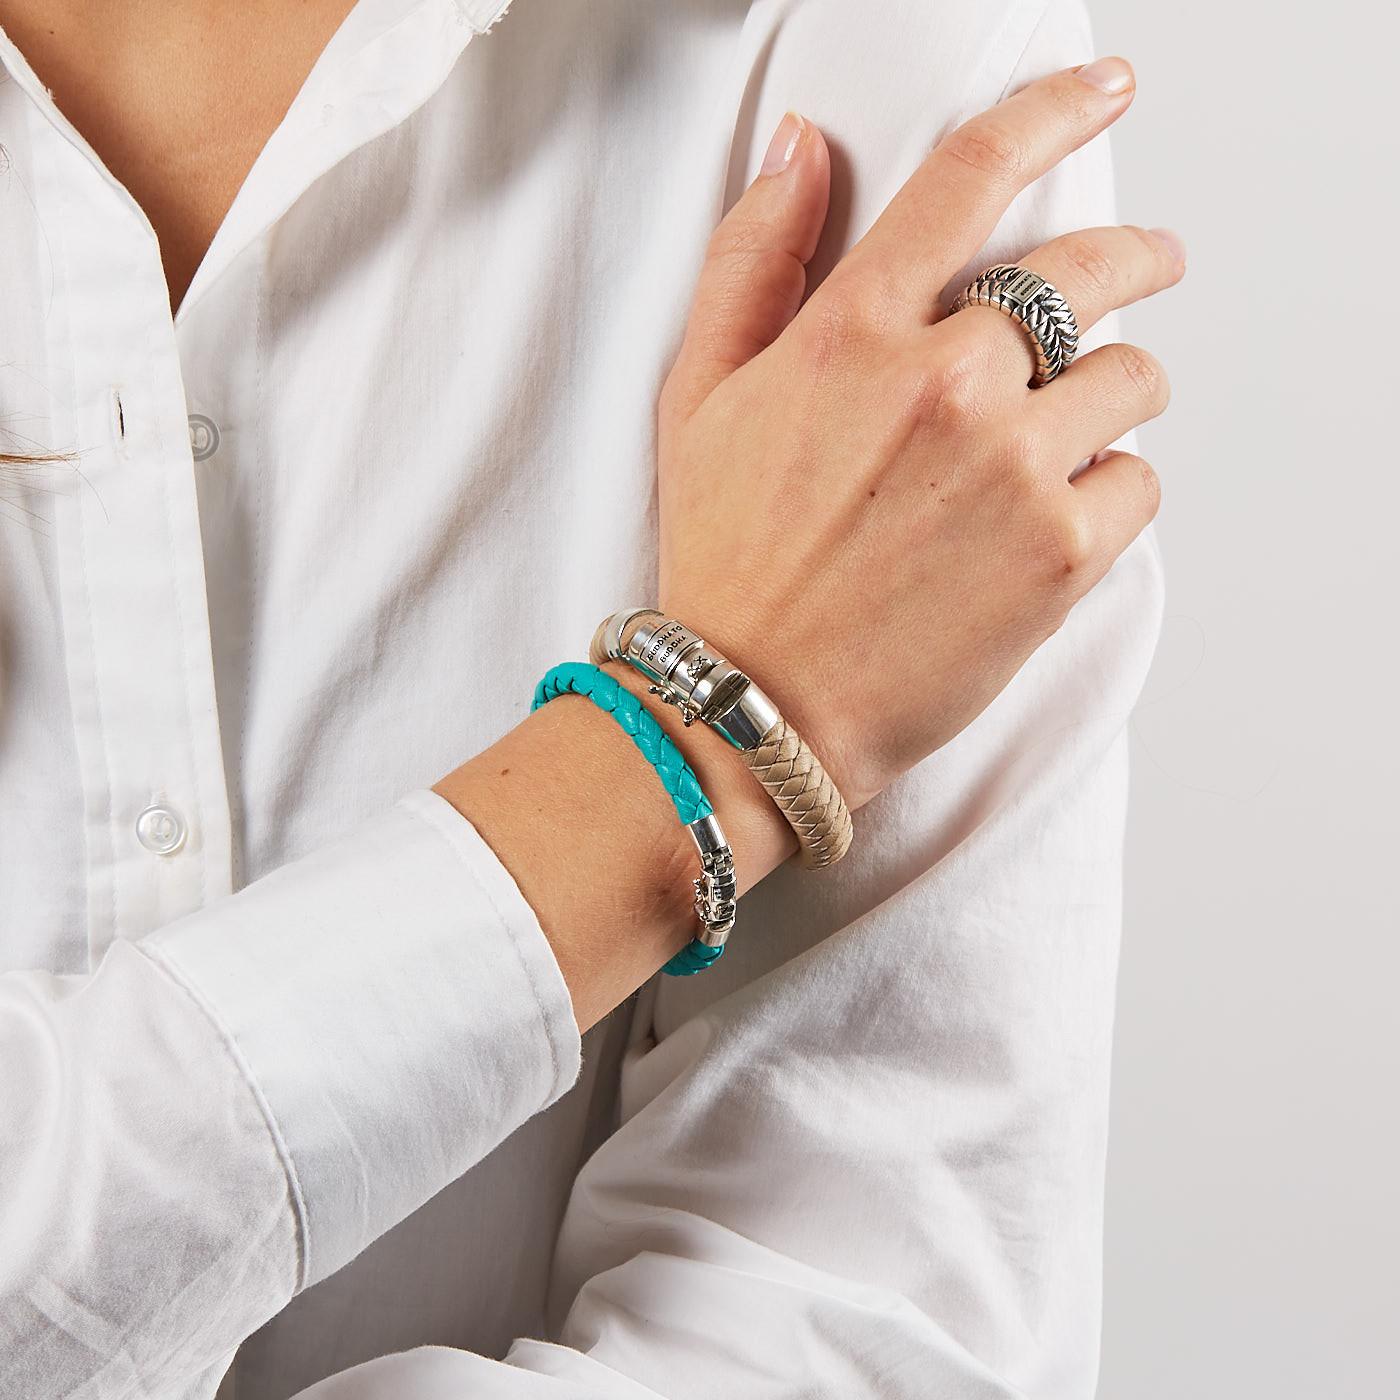 Buddha To Buddha Armband Blauw.Buddha To Buddha 925 Sterling Zilveren Ben Xs Round Leather Aqua Armband J545aq Lengte 17 00 23 00 Cm